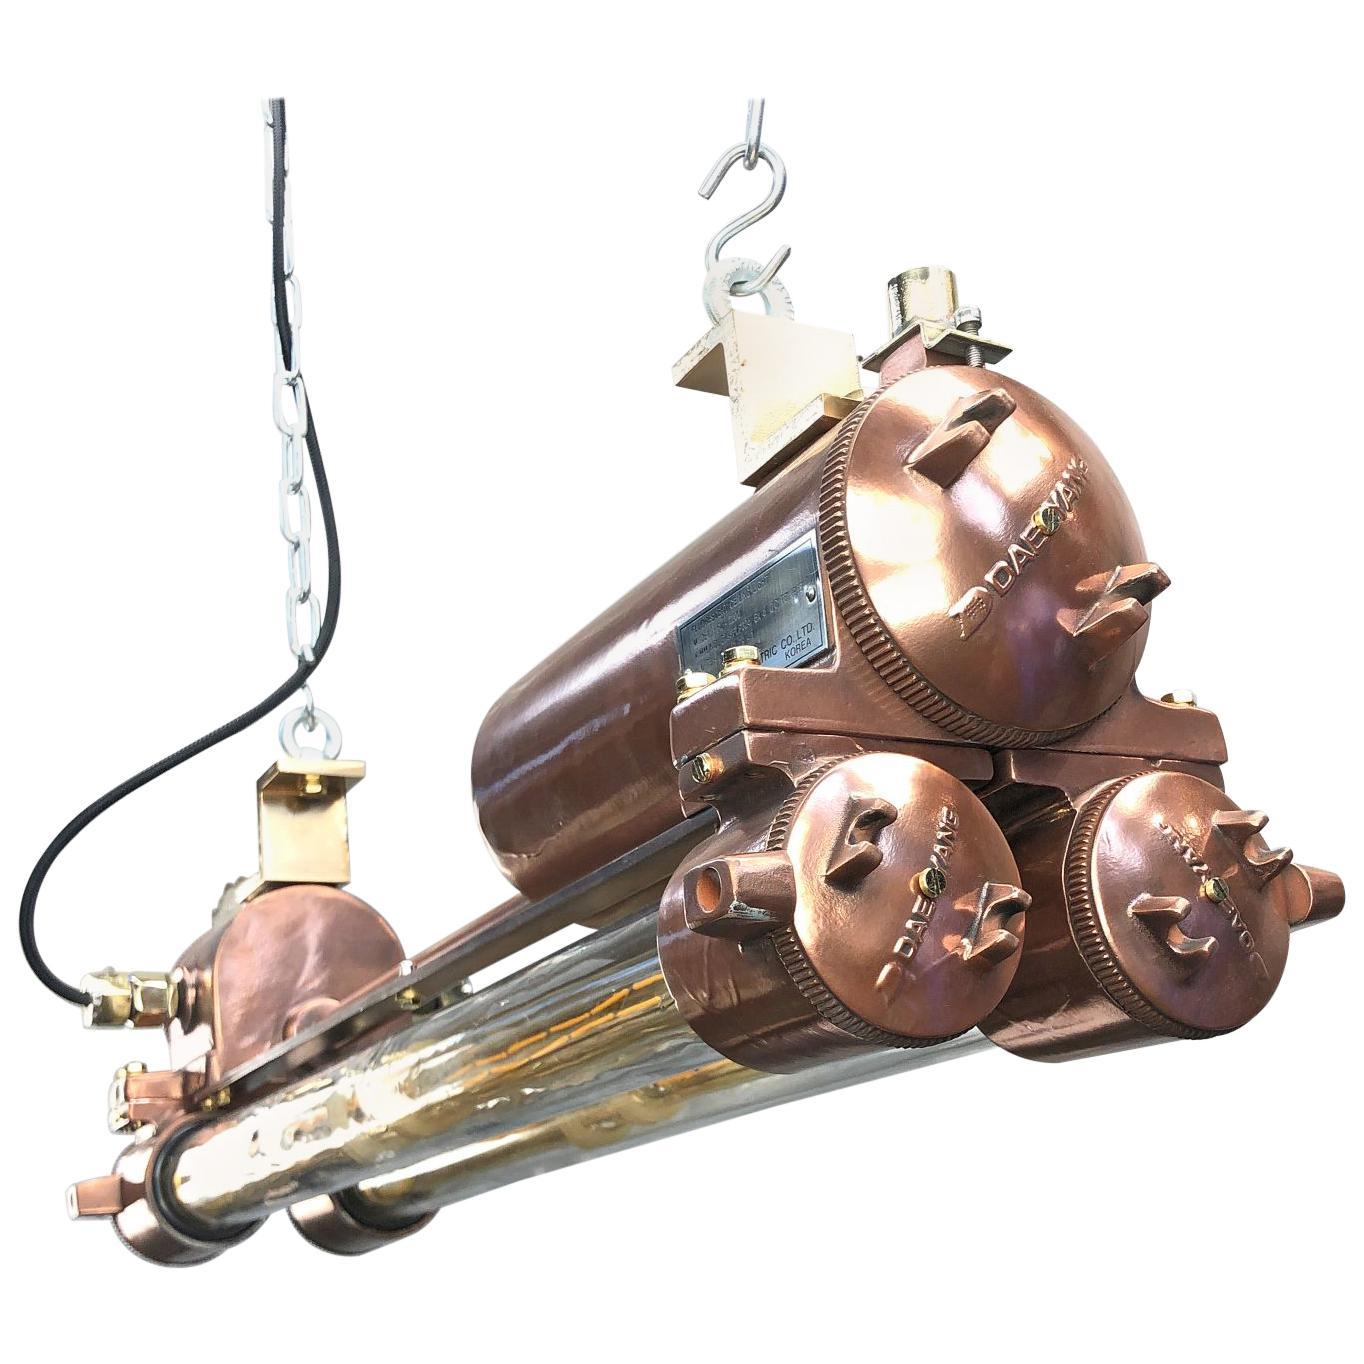 1970s Industrial Copper Flameproof LED Edison Tube Ceiling Strip Lighting